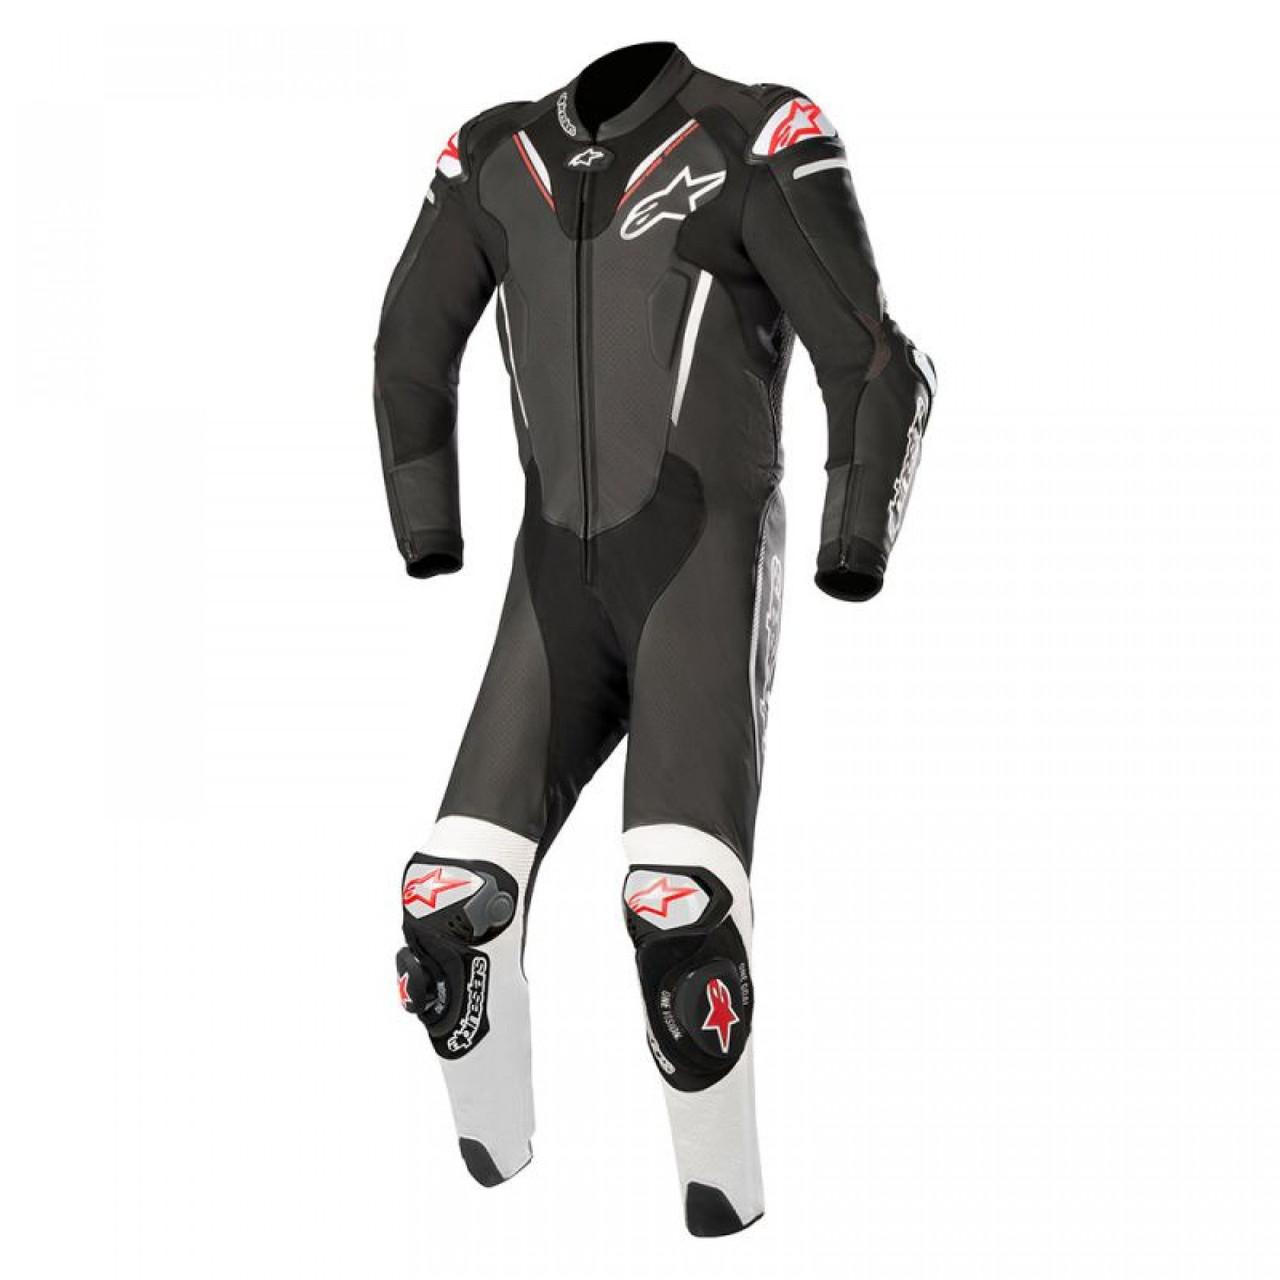 Комбинезон Alpinestars Atem V3 Leather Suit 1 PC 52